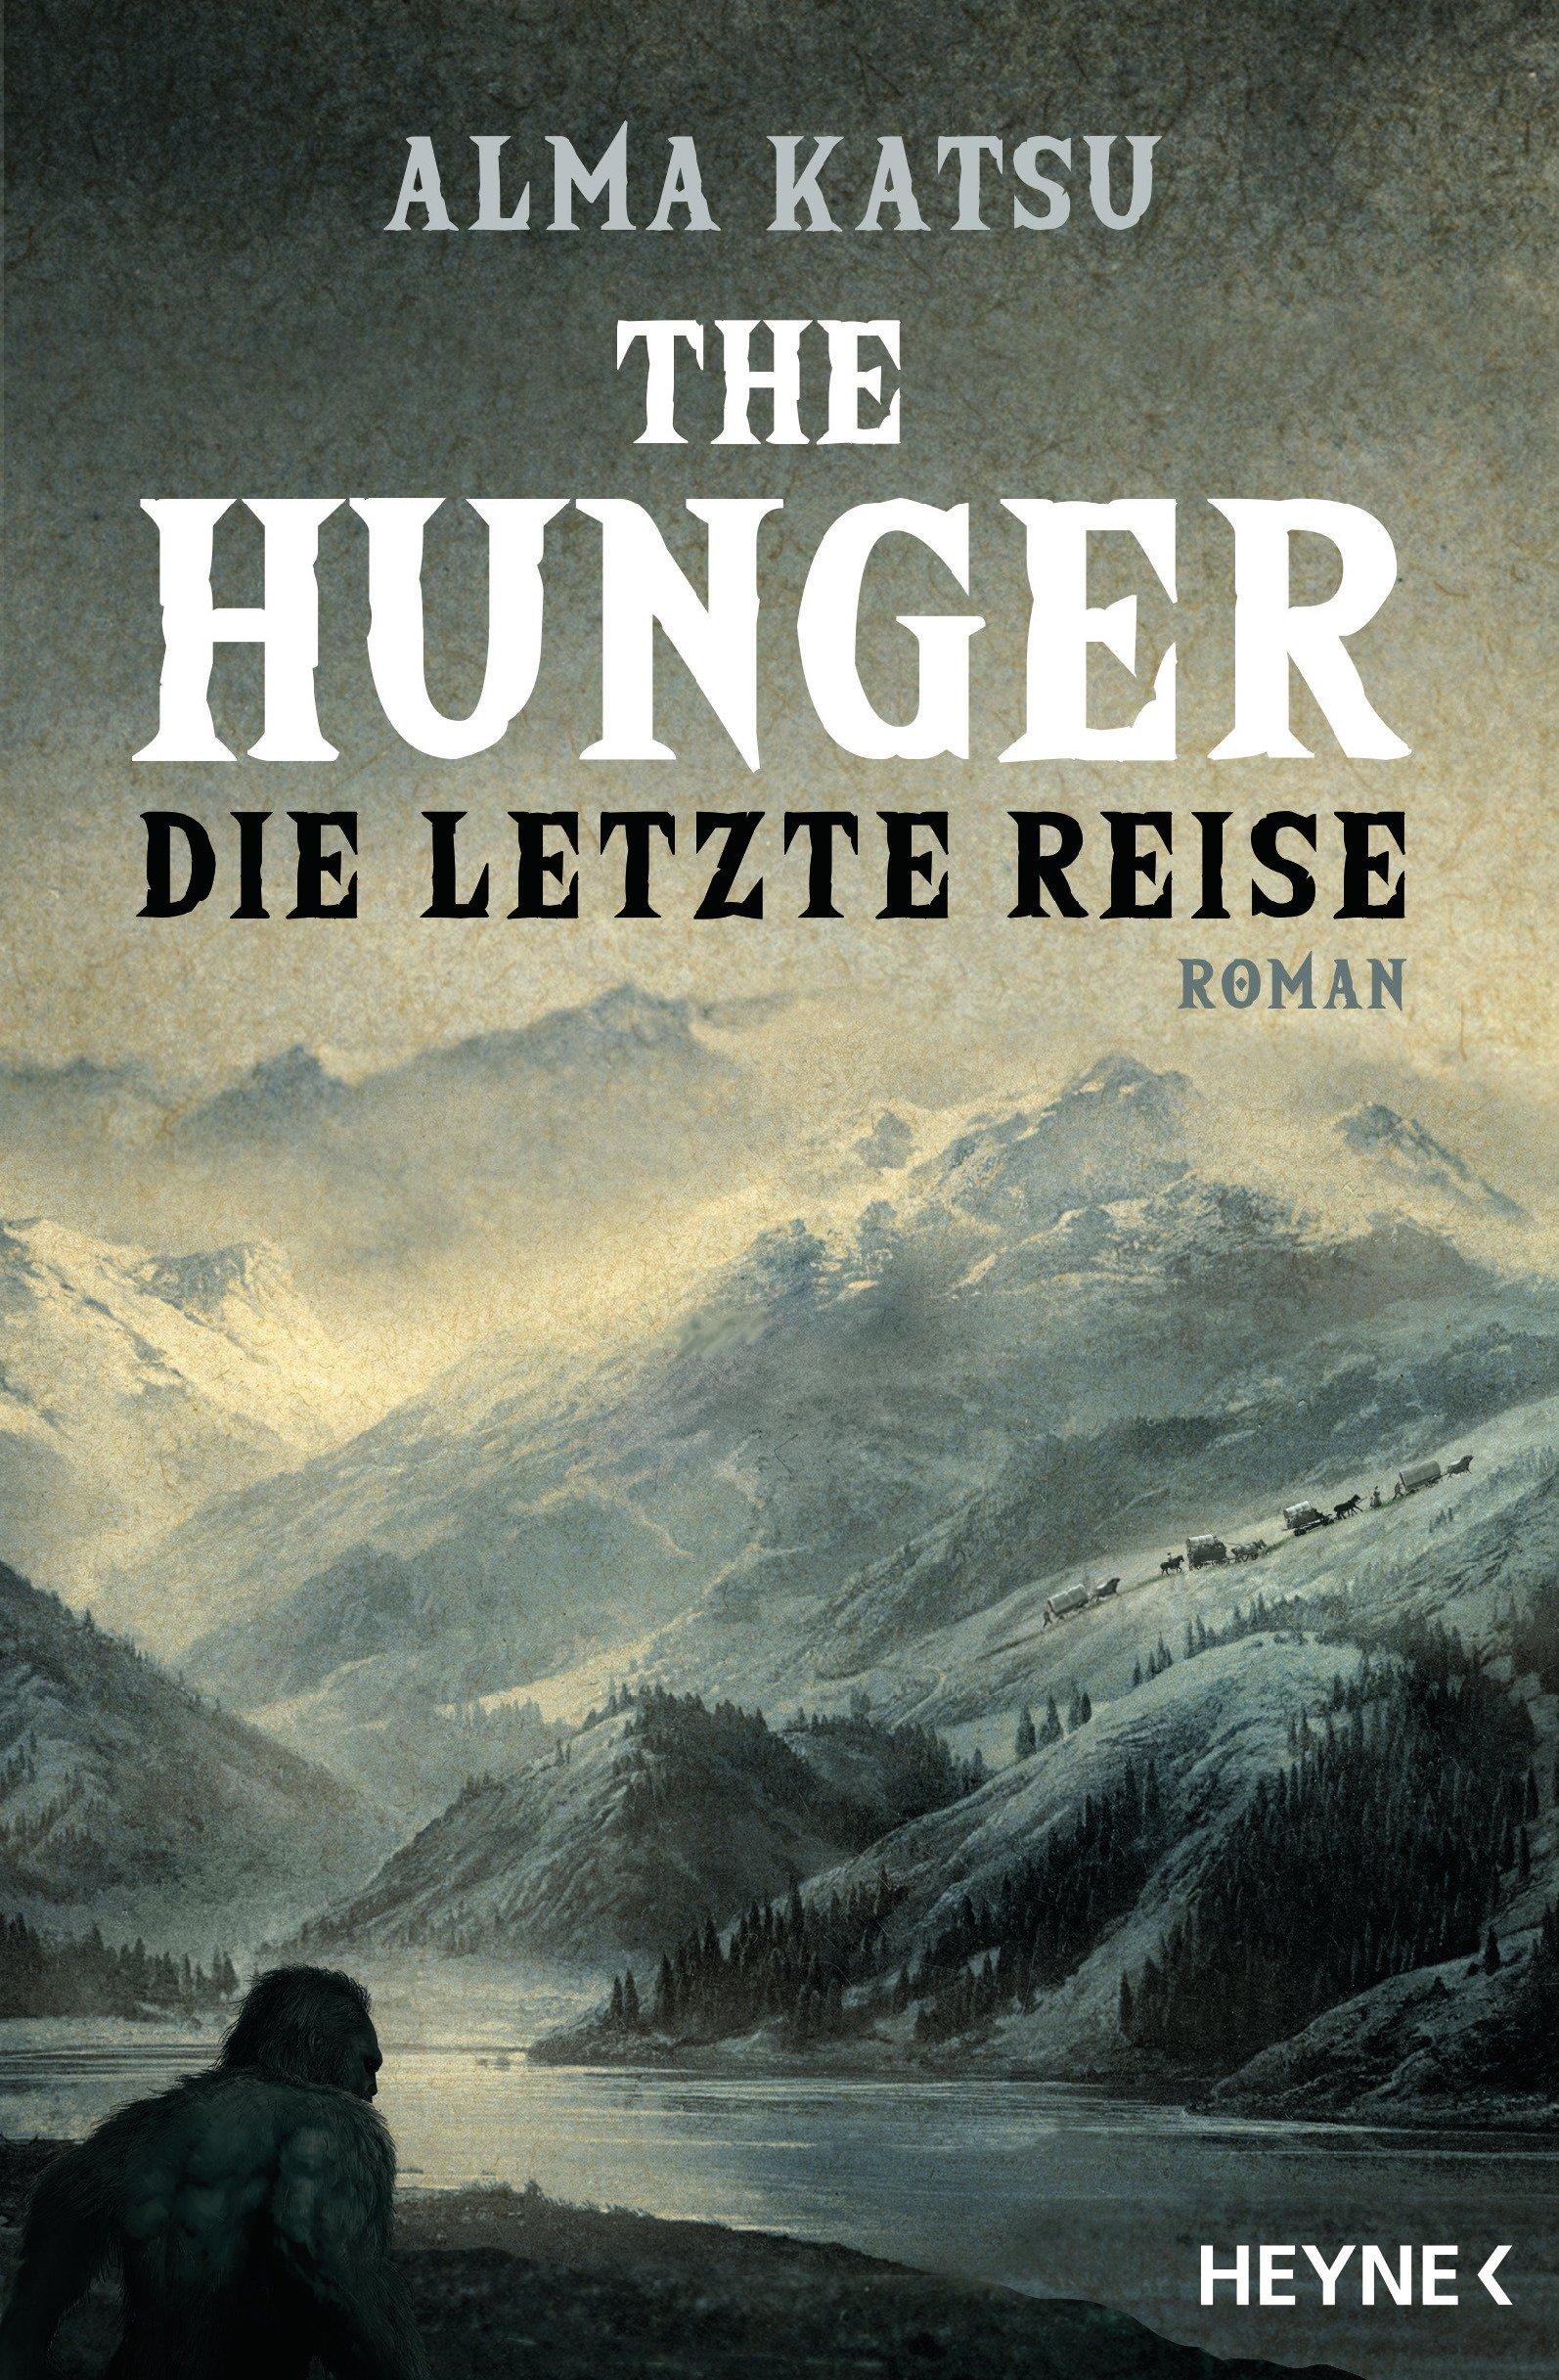 The Hunger - Die letzte Reise: Roman